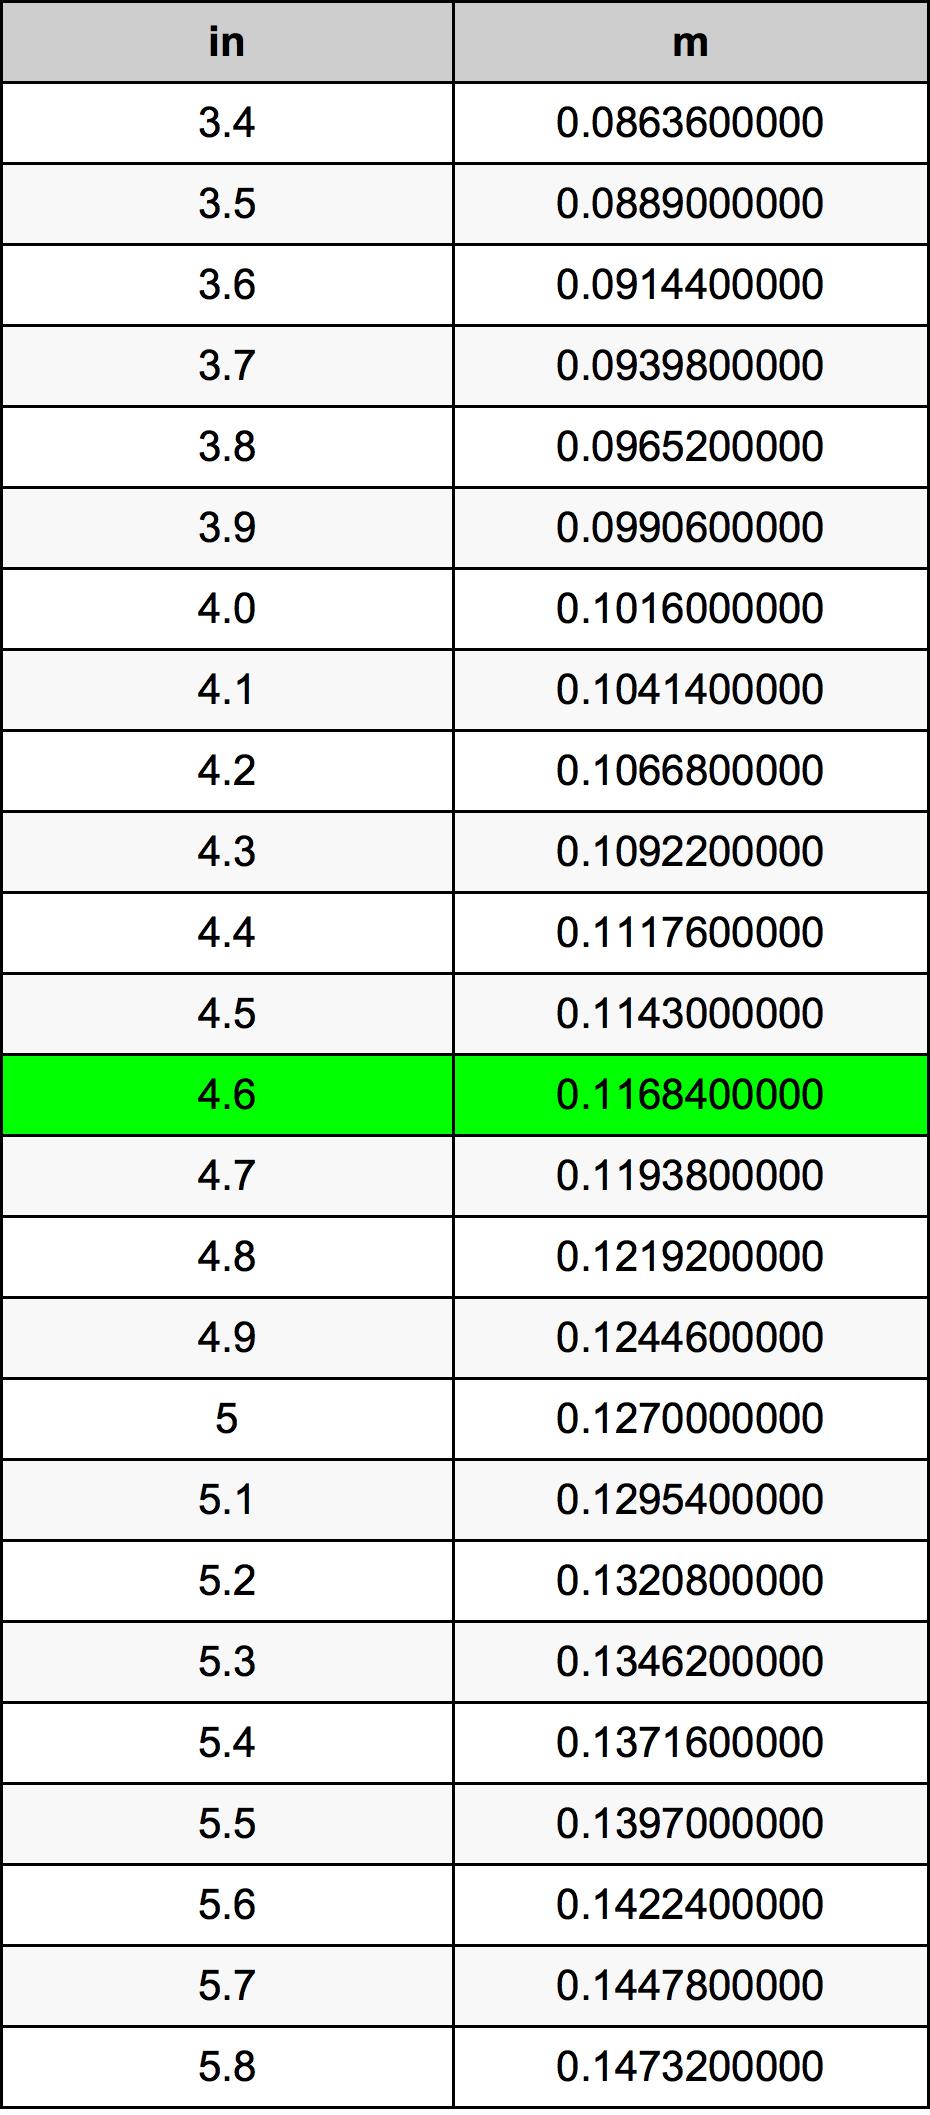 4.6 इंच रूपांतरण सारणी